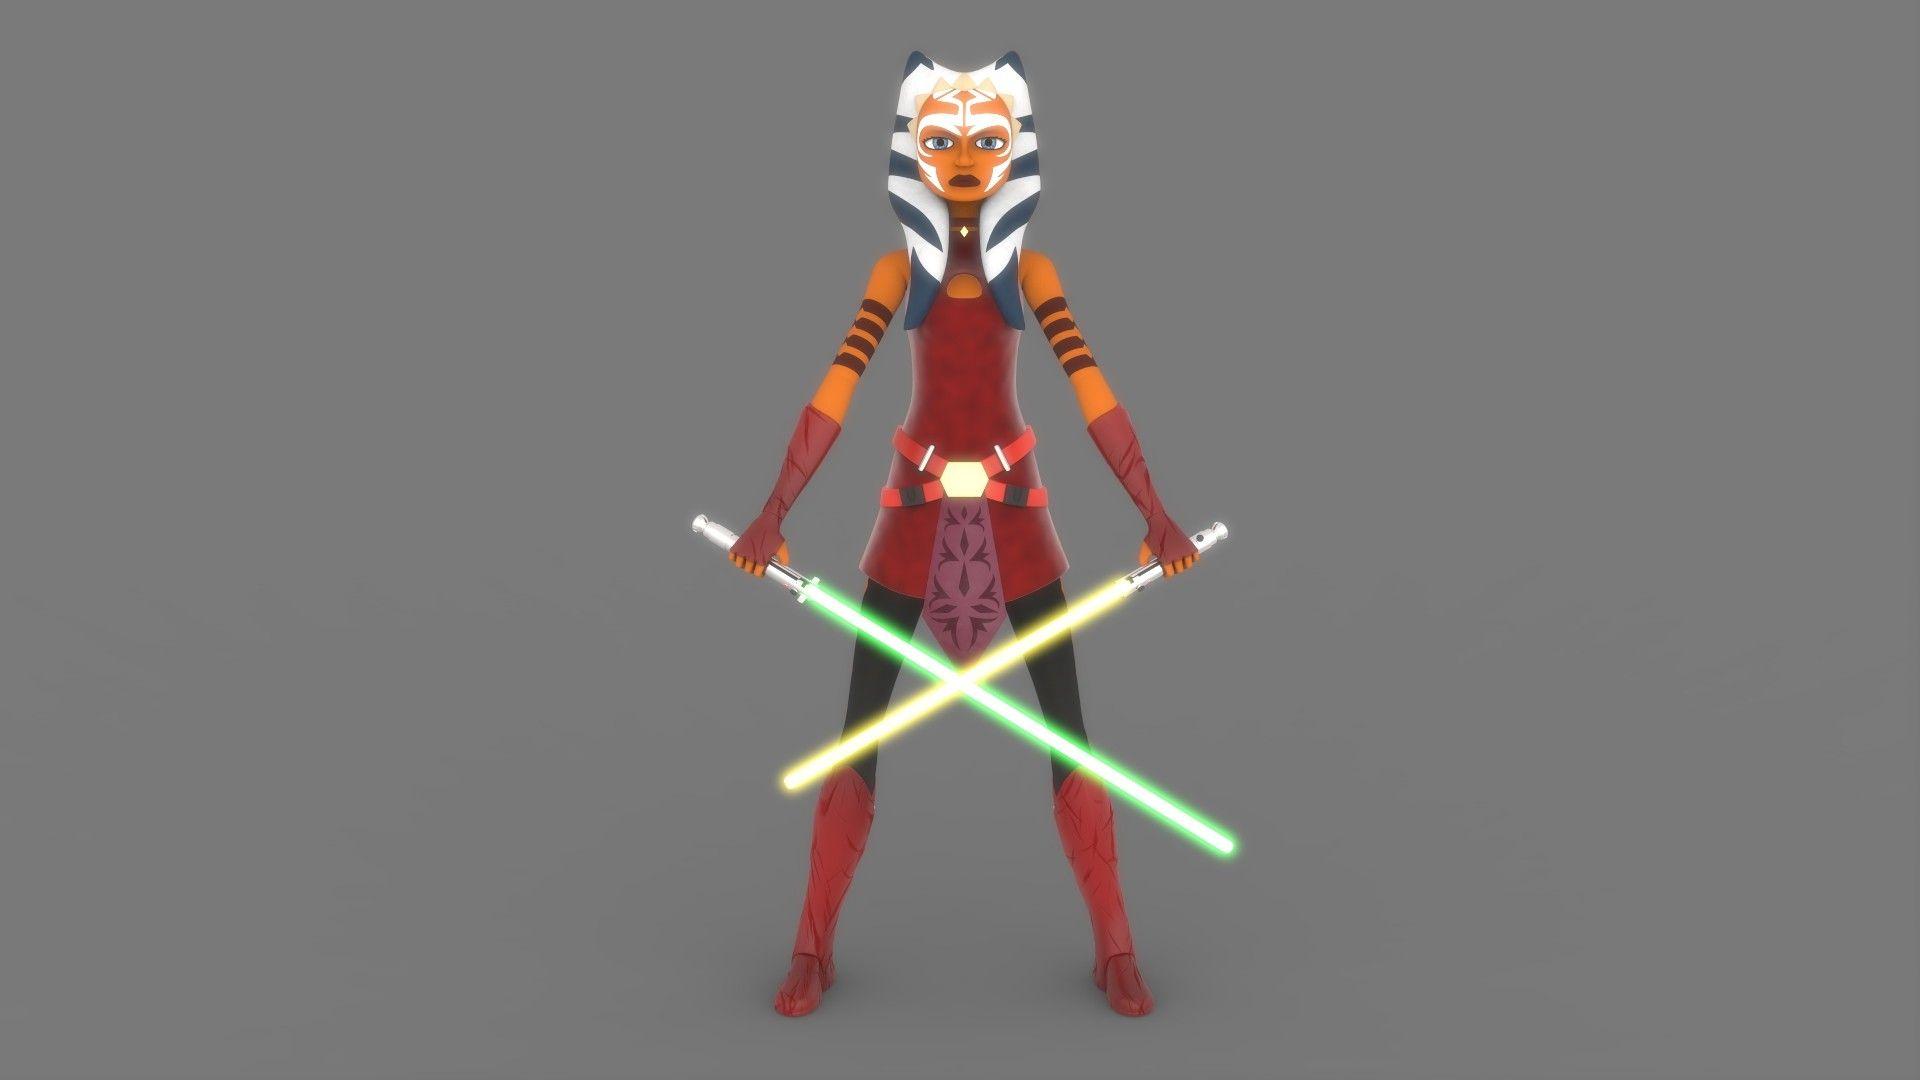 Star Wars The Clone Wars Ahsoka Tano